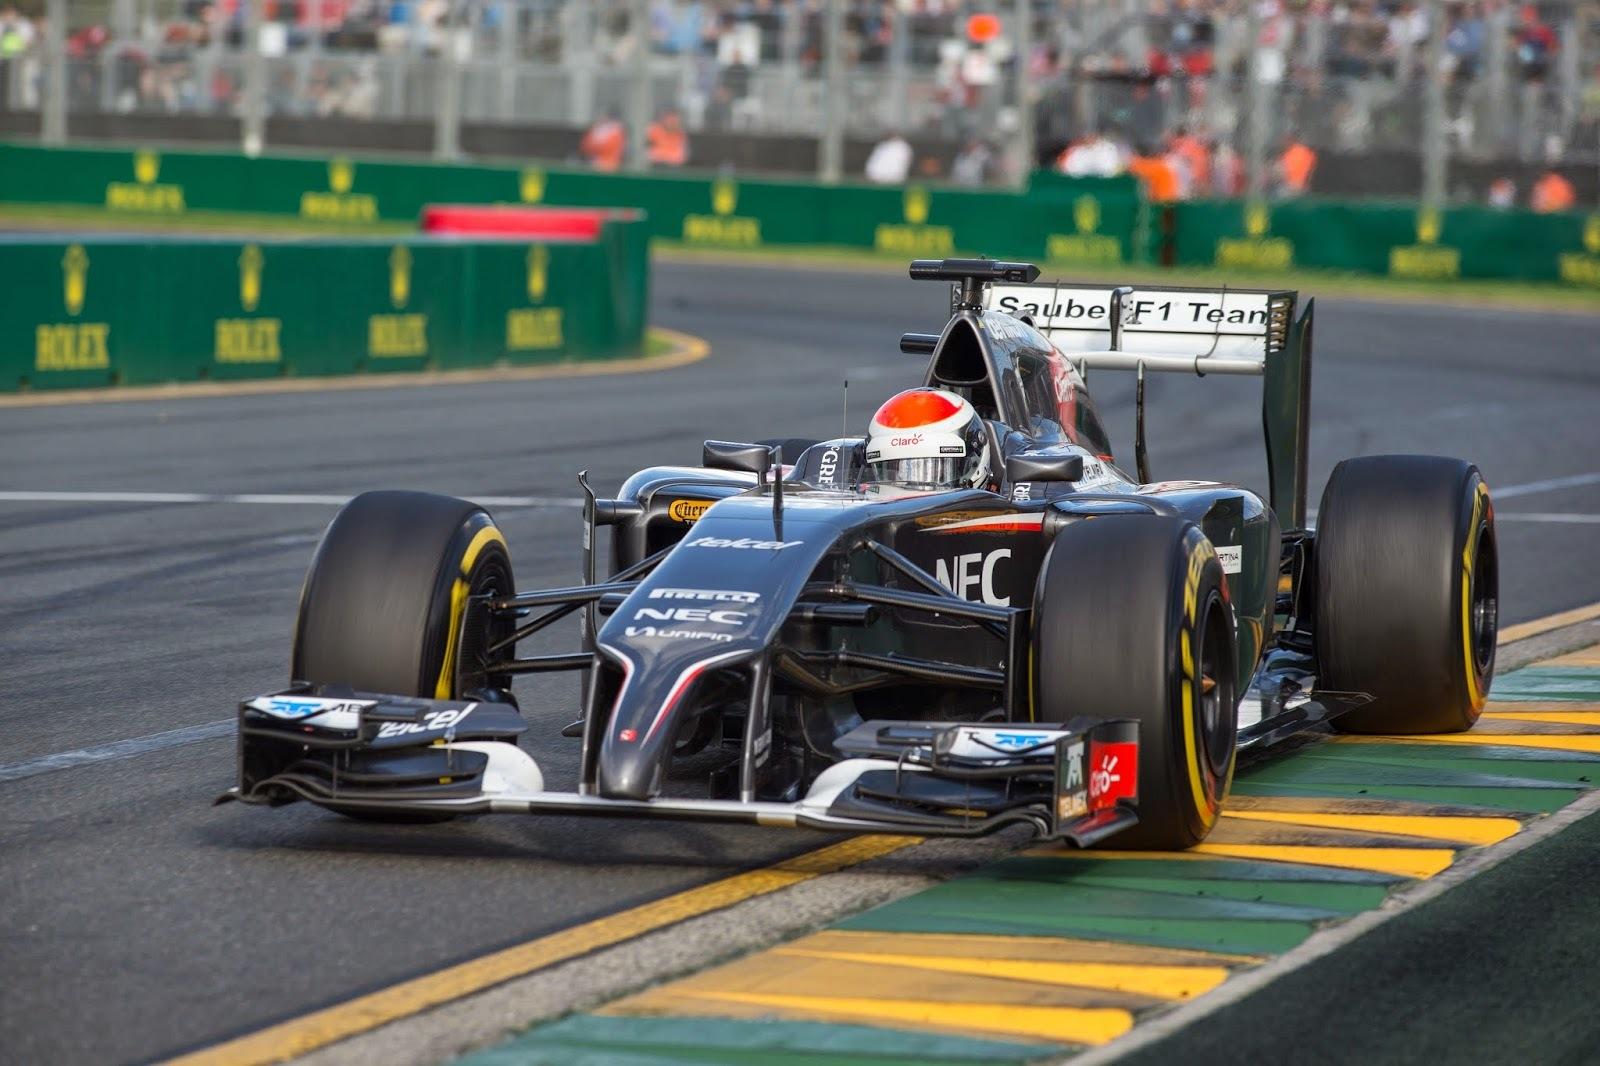 Sauber GP Australia 2014 Adrian Sutil